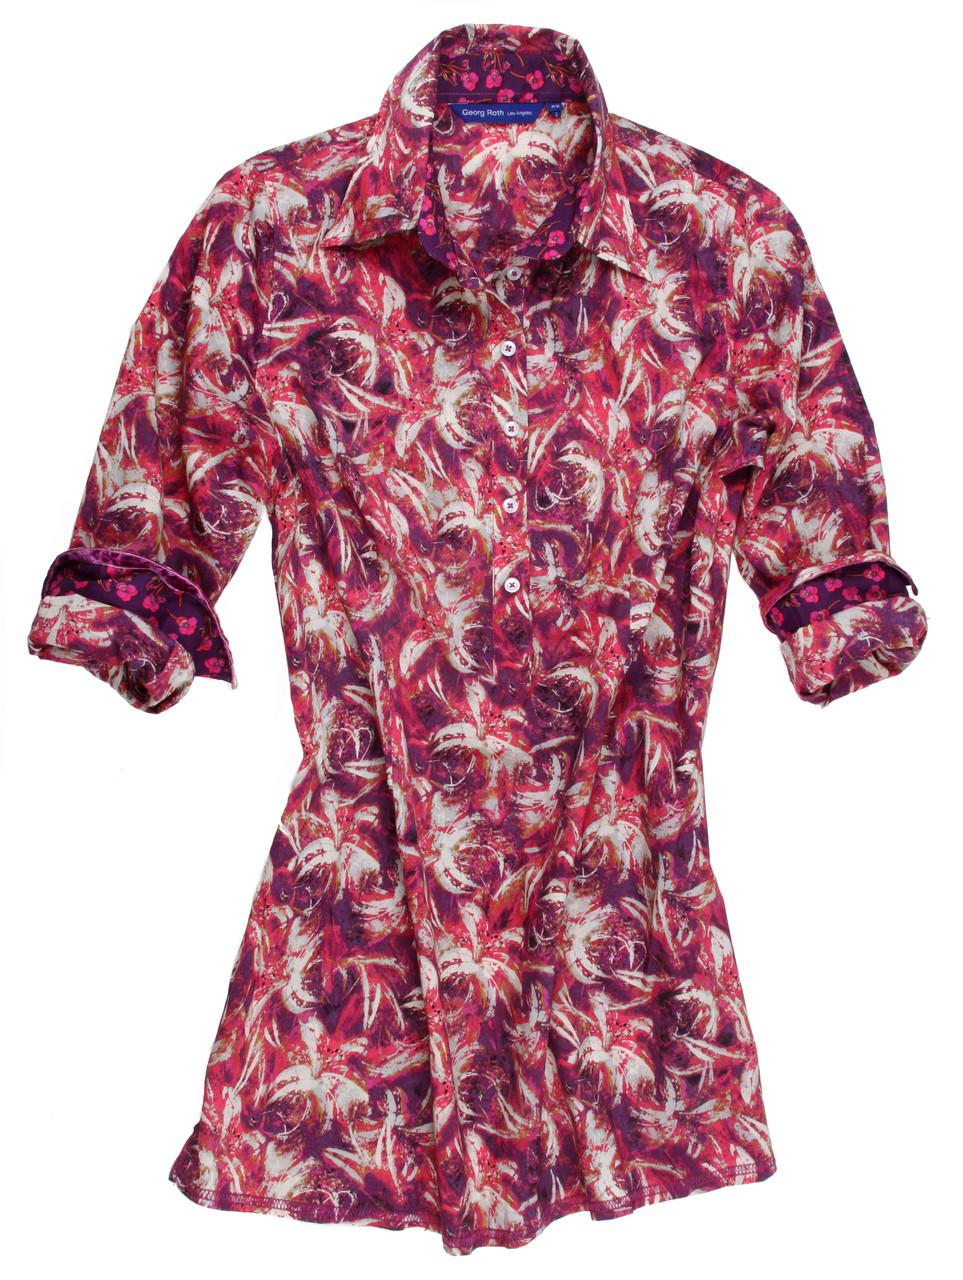 b09a0e70f2c Gigi is the life of the party! A vibrant print in magenta, fuchsia and